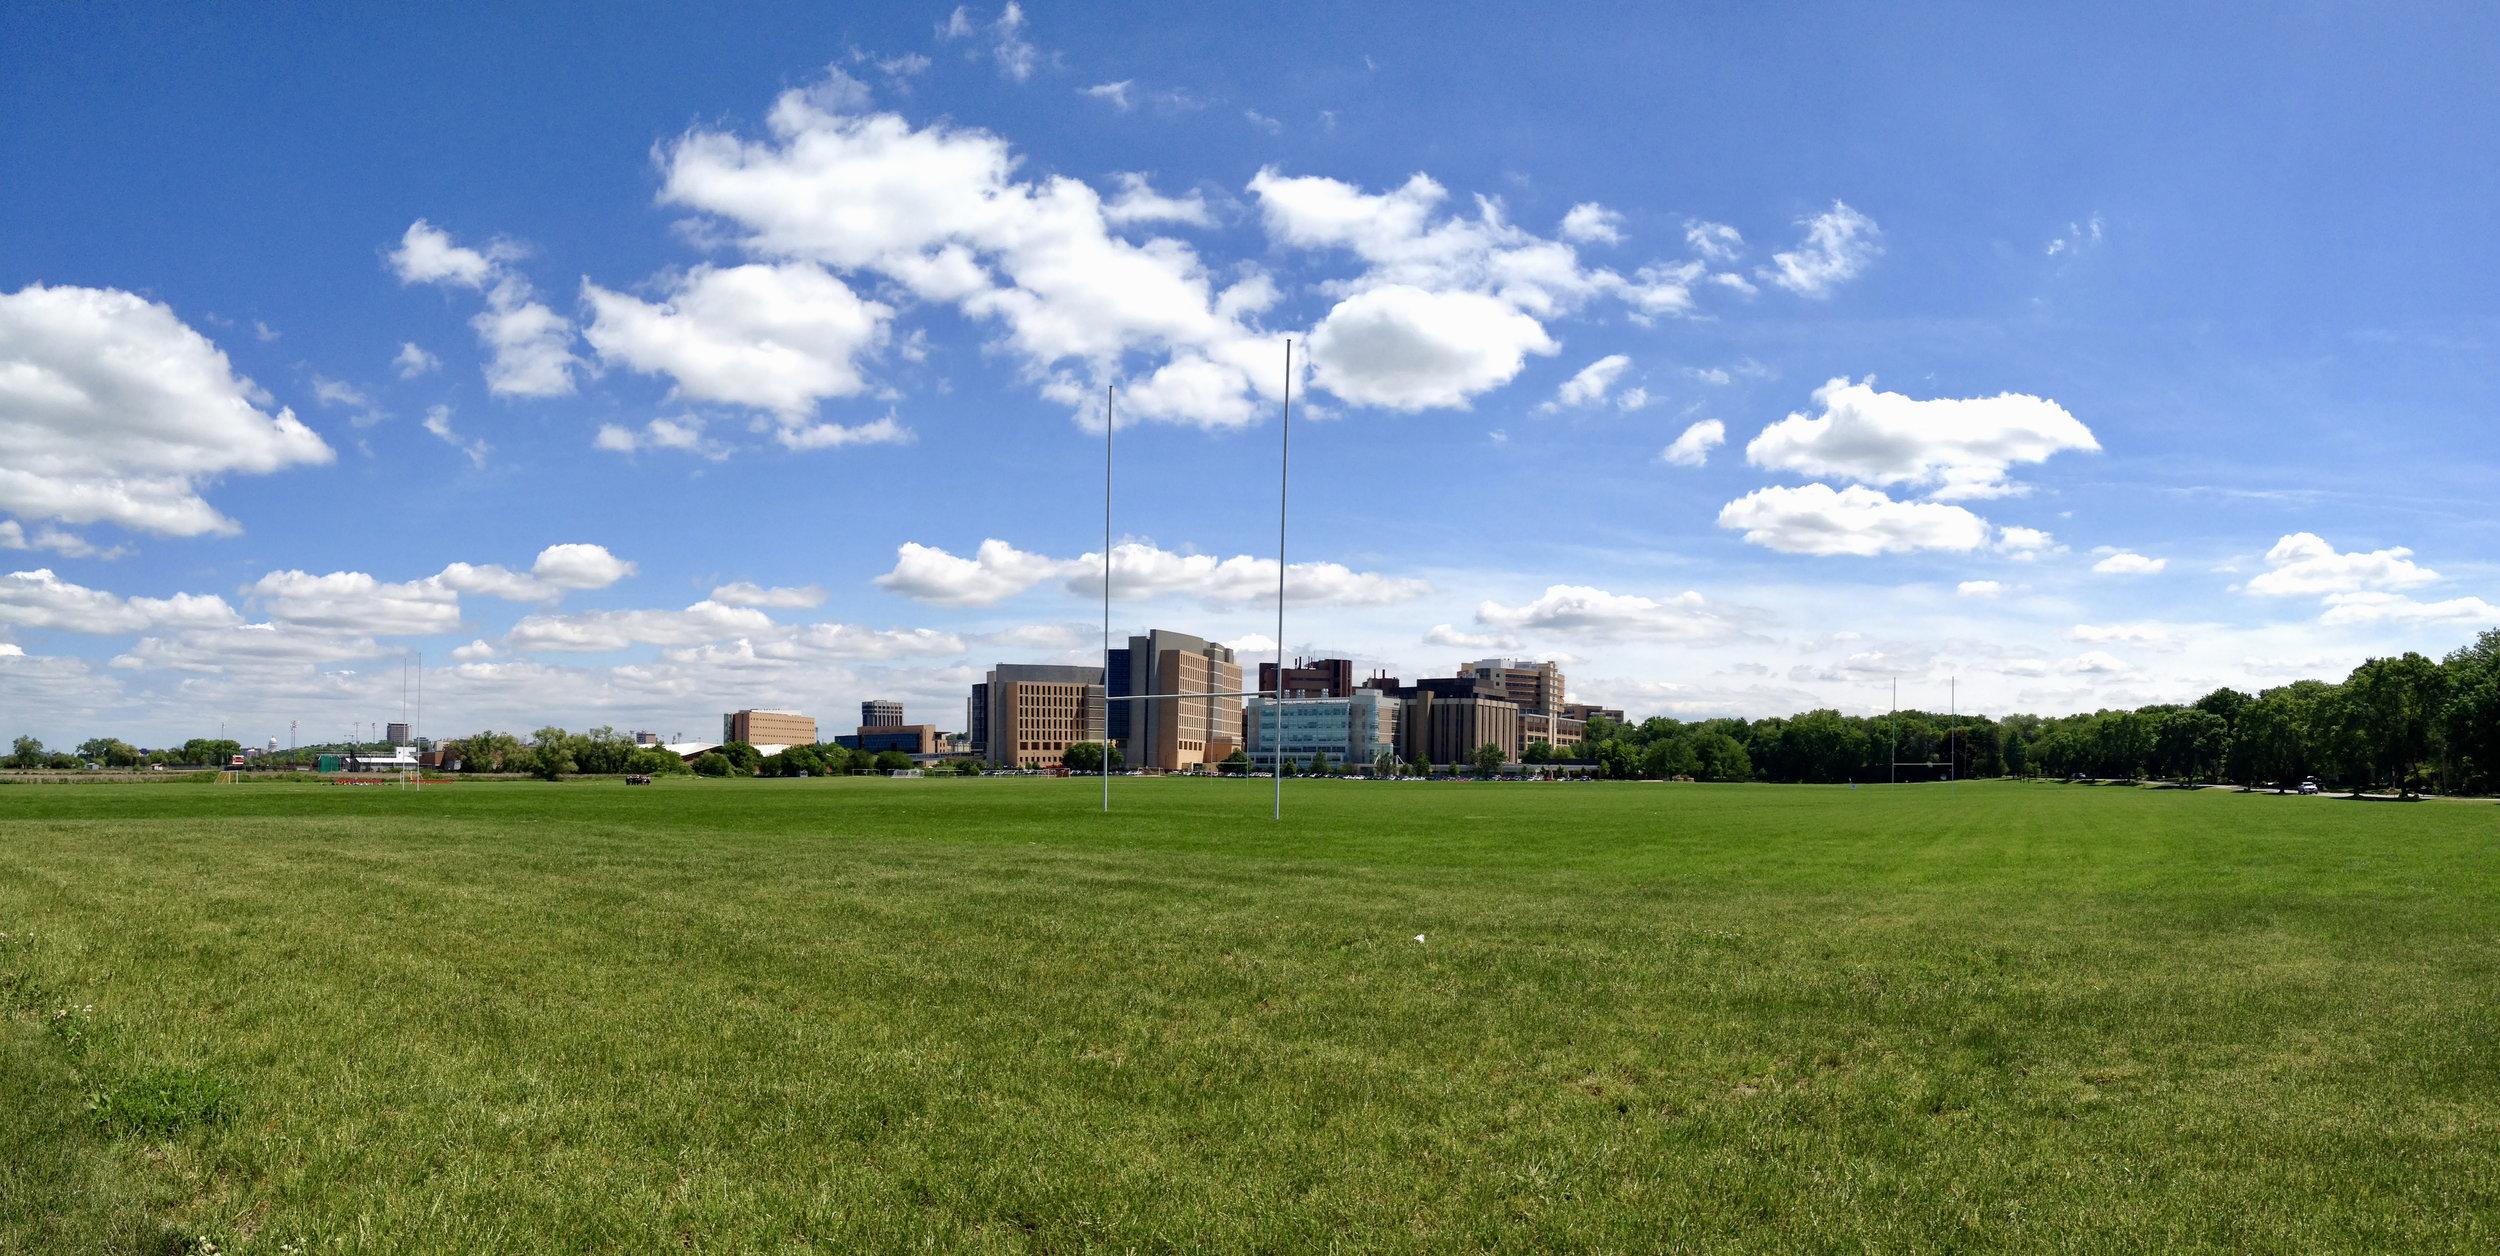 Goal. University Hospital. Madison, Wisconsin. June 2014. © William D. Walker